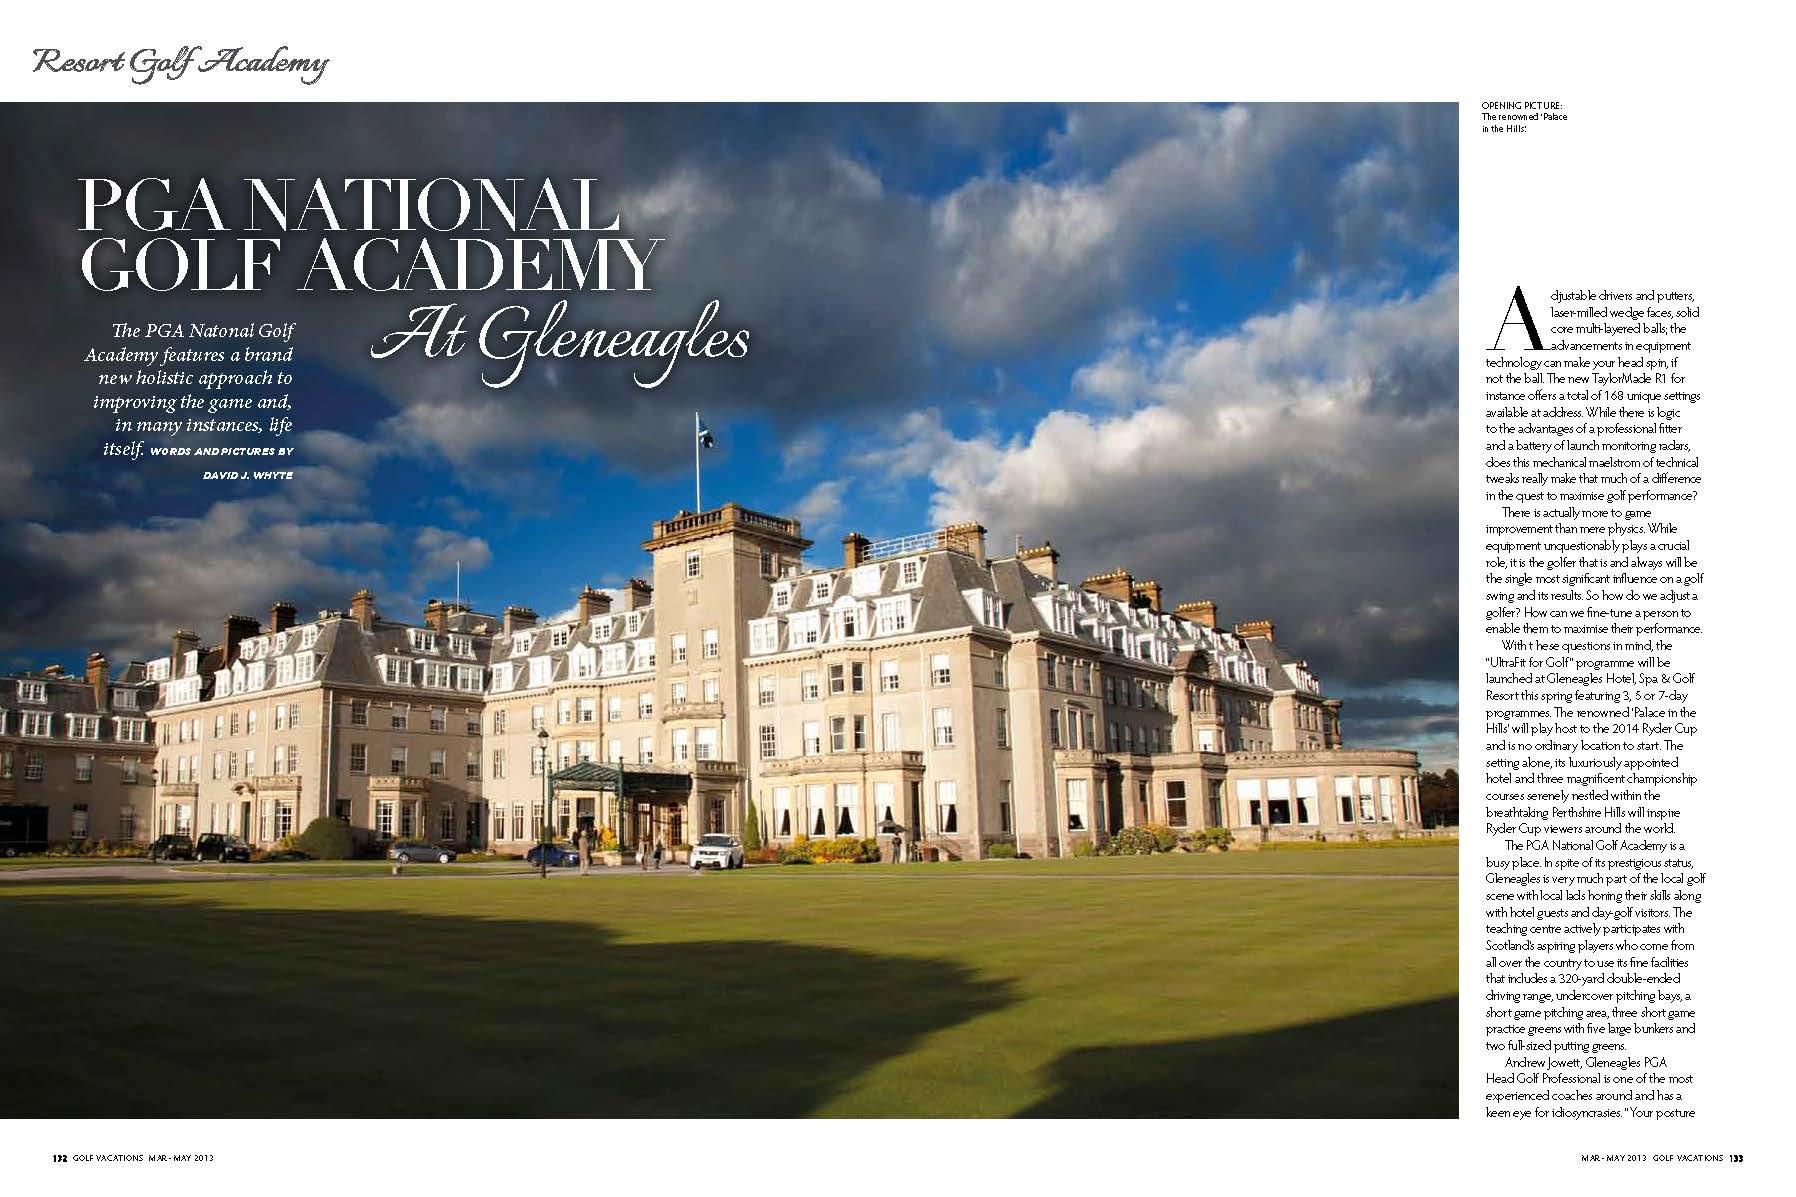 Gleneagles PGA Academy - Golf Vacations_Page_1.jpg